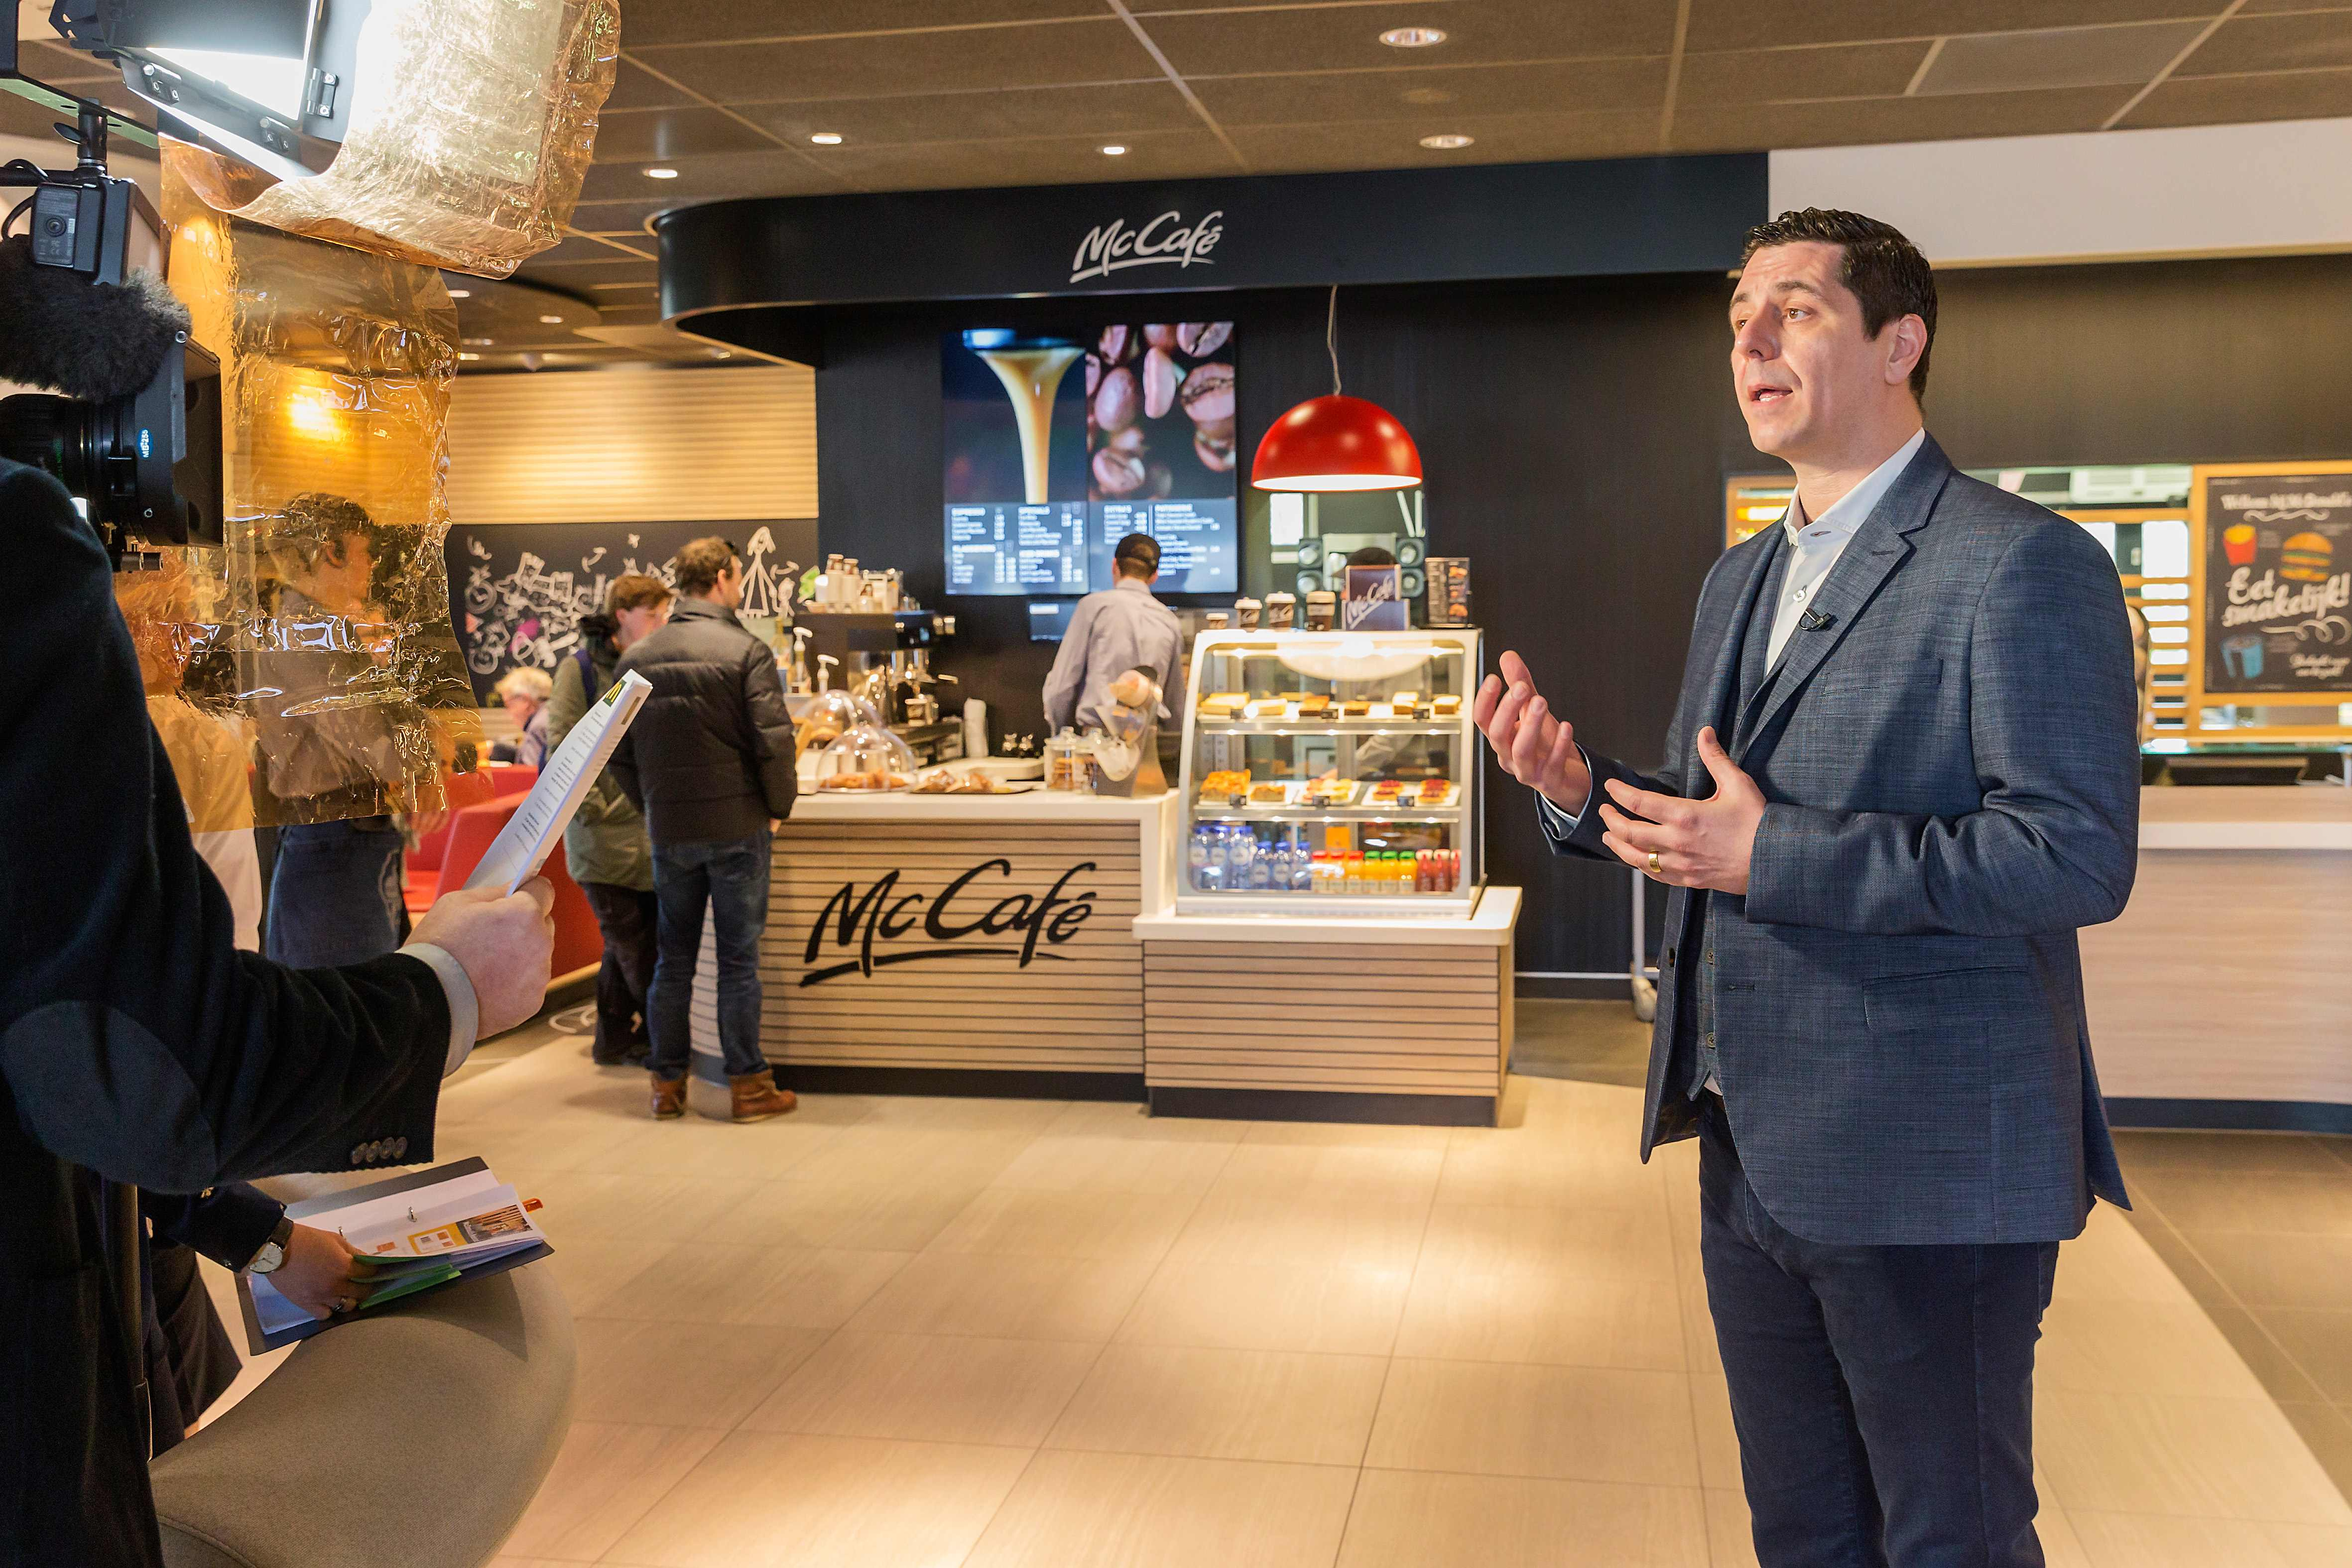 Algemeen Directeur van McDonald's Nederland Manu Steijaert in gesprek met media. Bron: FranchiseFormules.NL